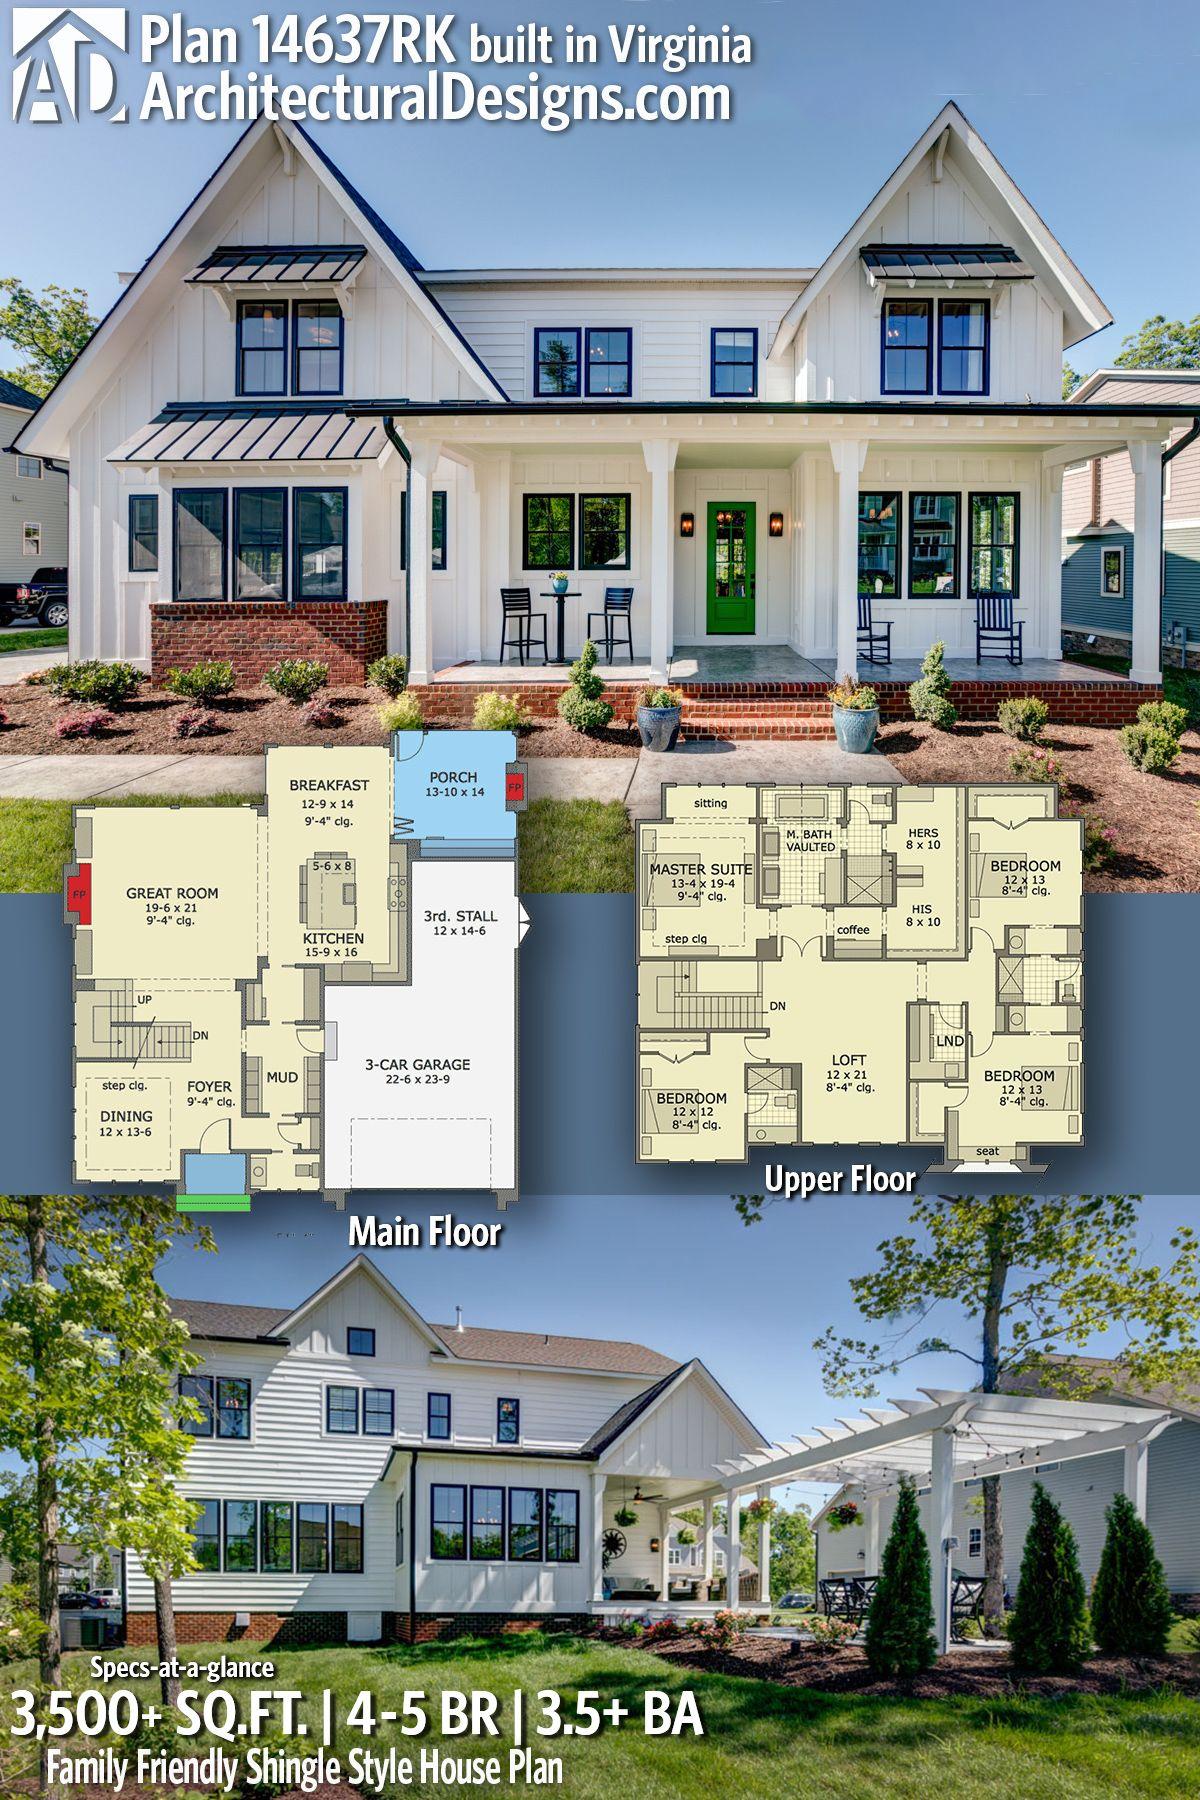 Plan 14637rk Family Friendly Shingle Style House Plan House